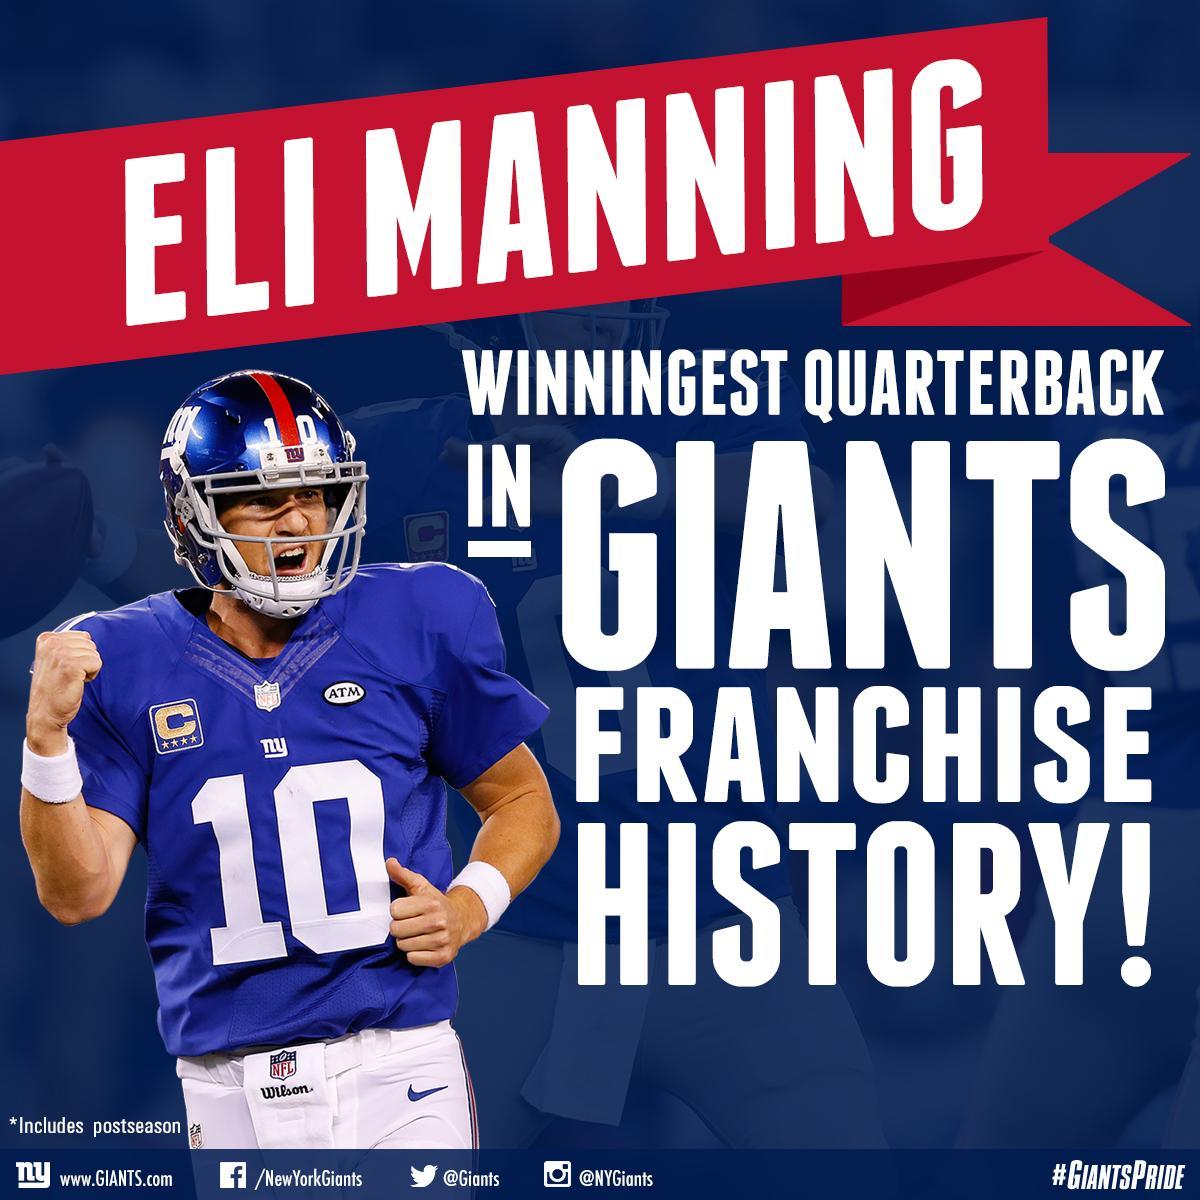 Eli manning dating history